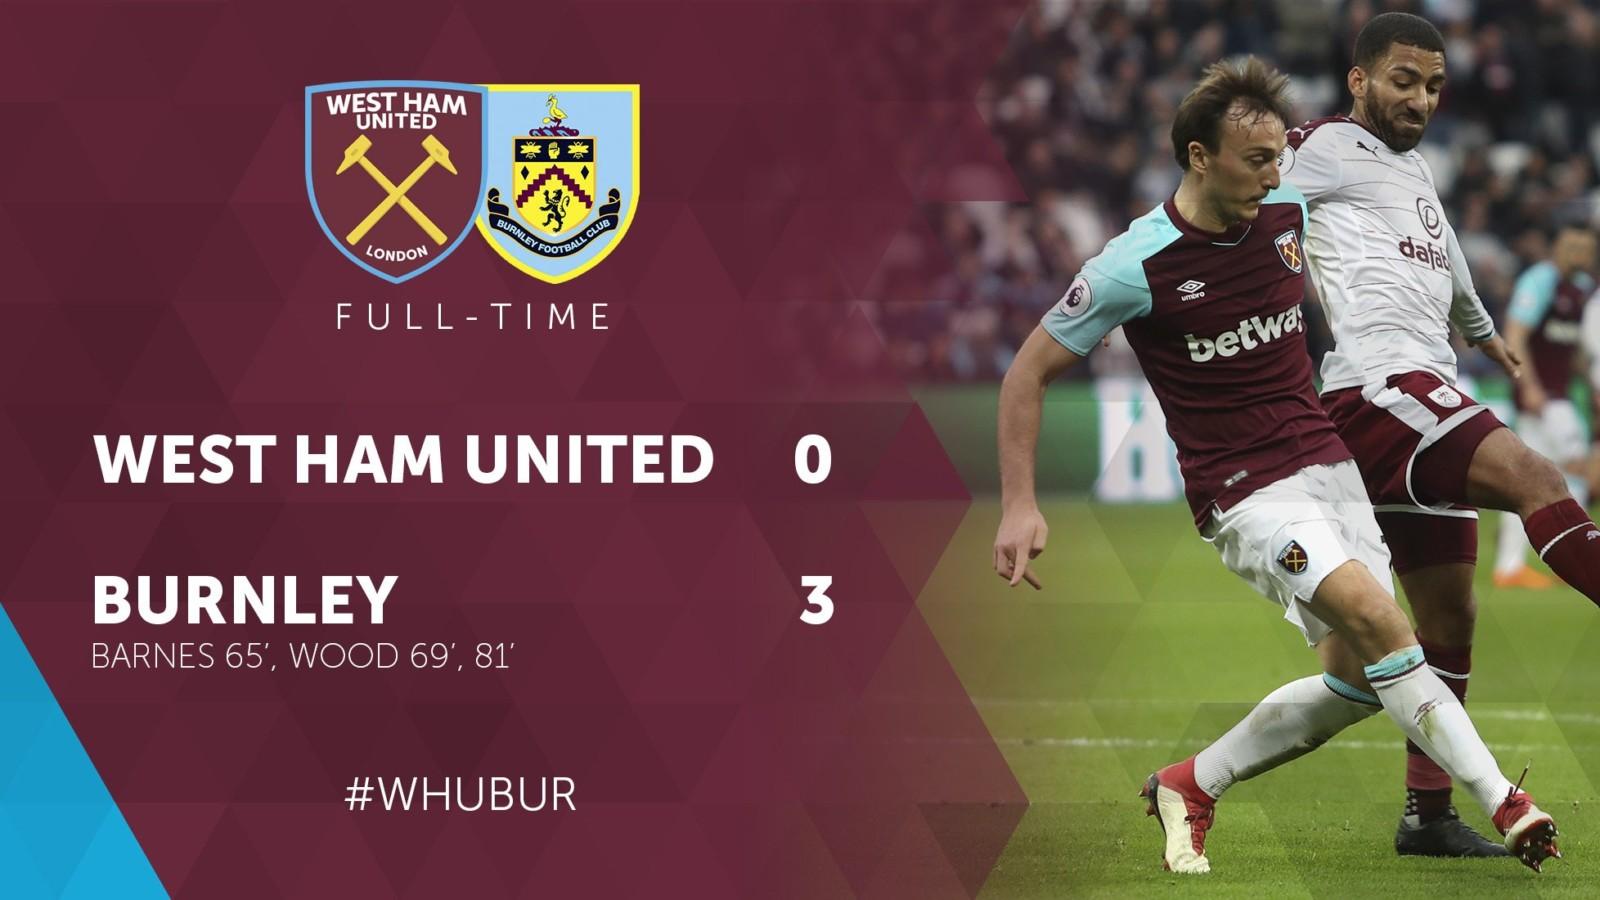 West Ham – Burnley 0 -3